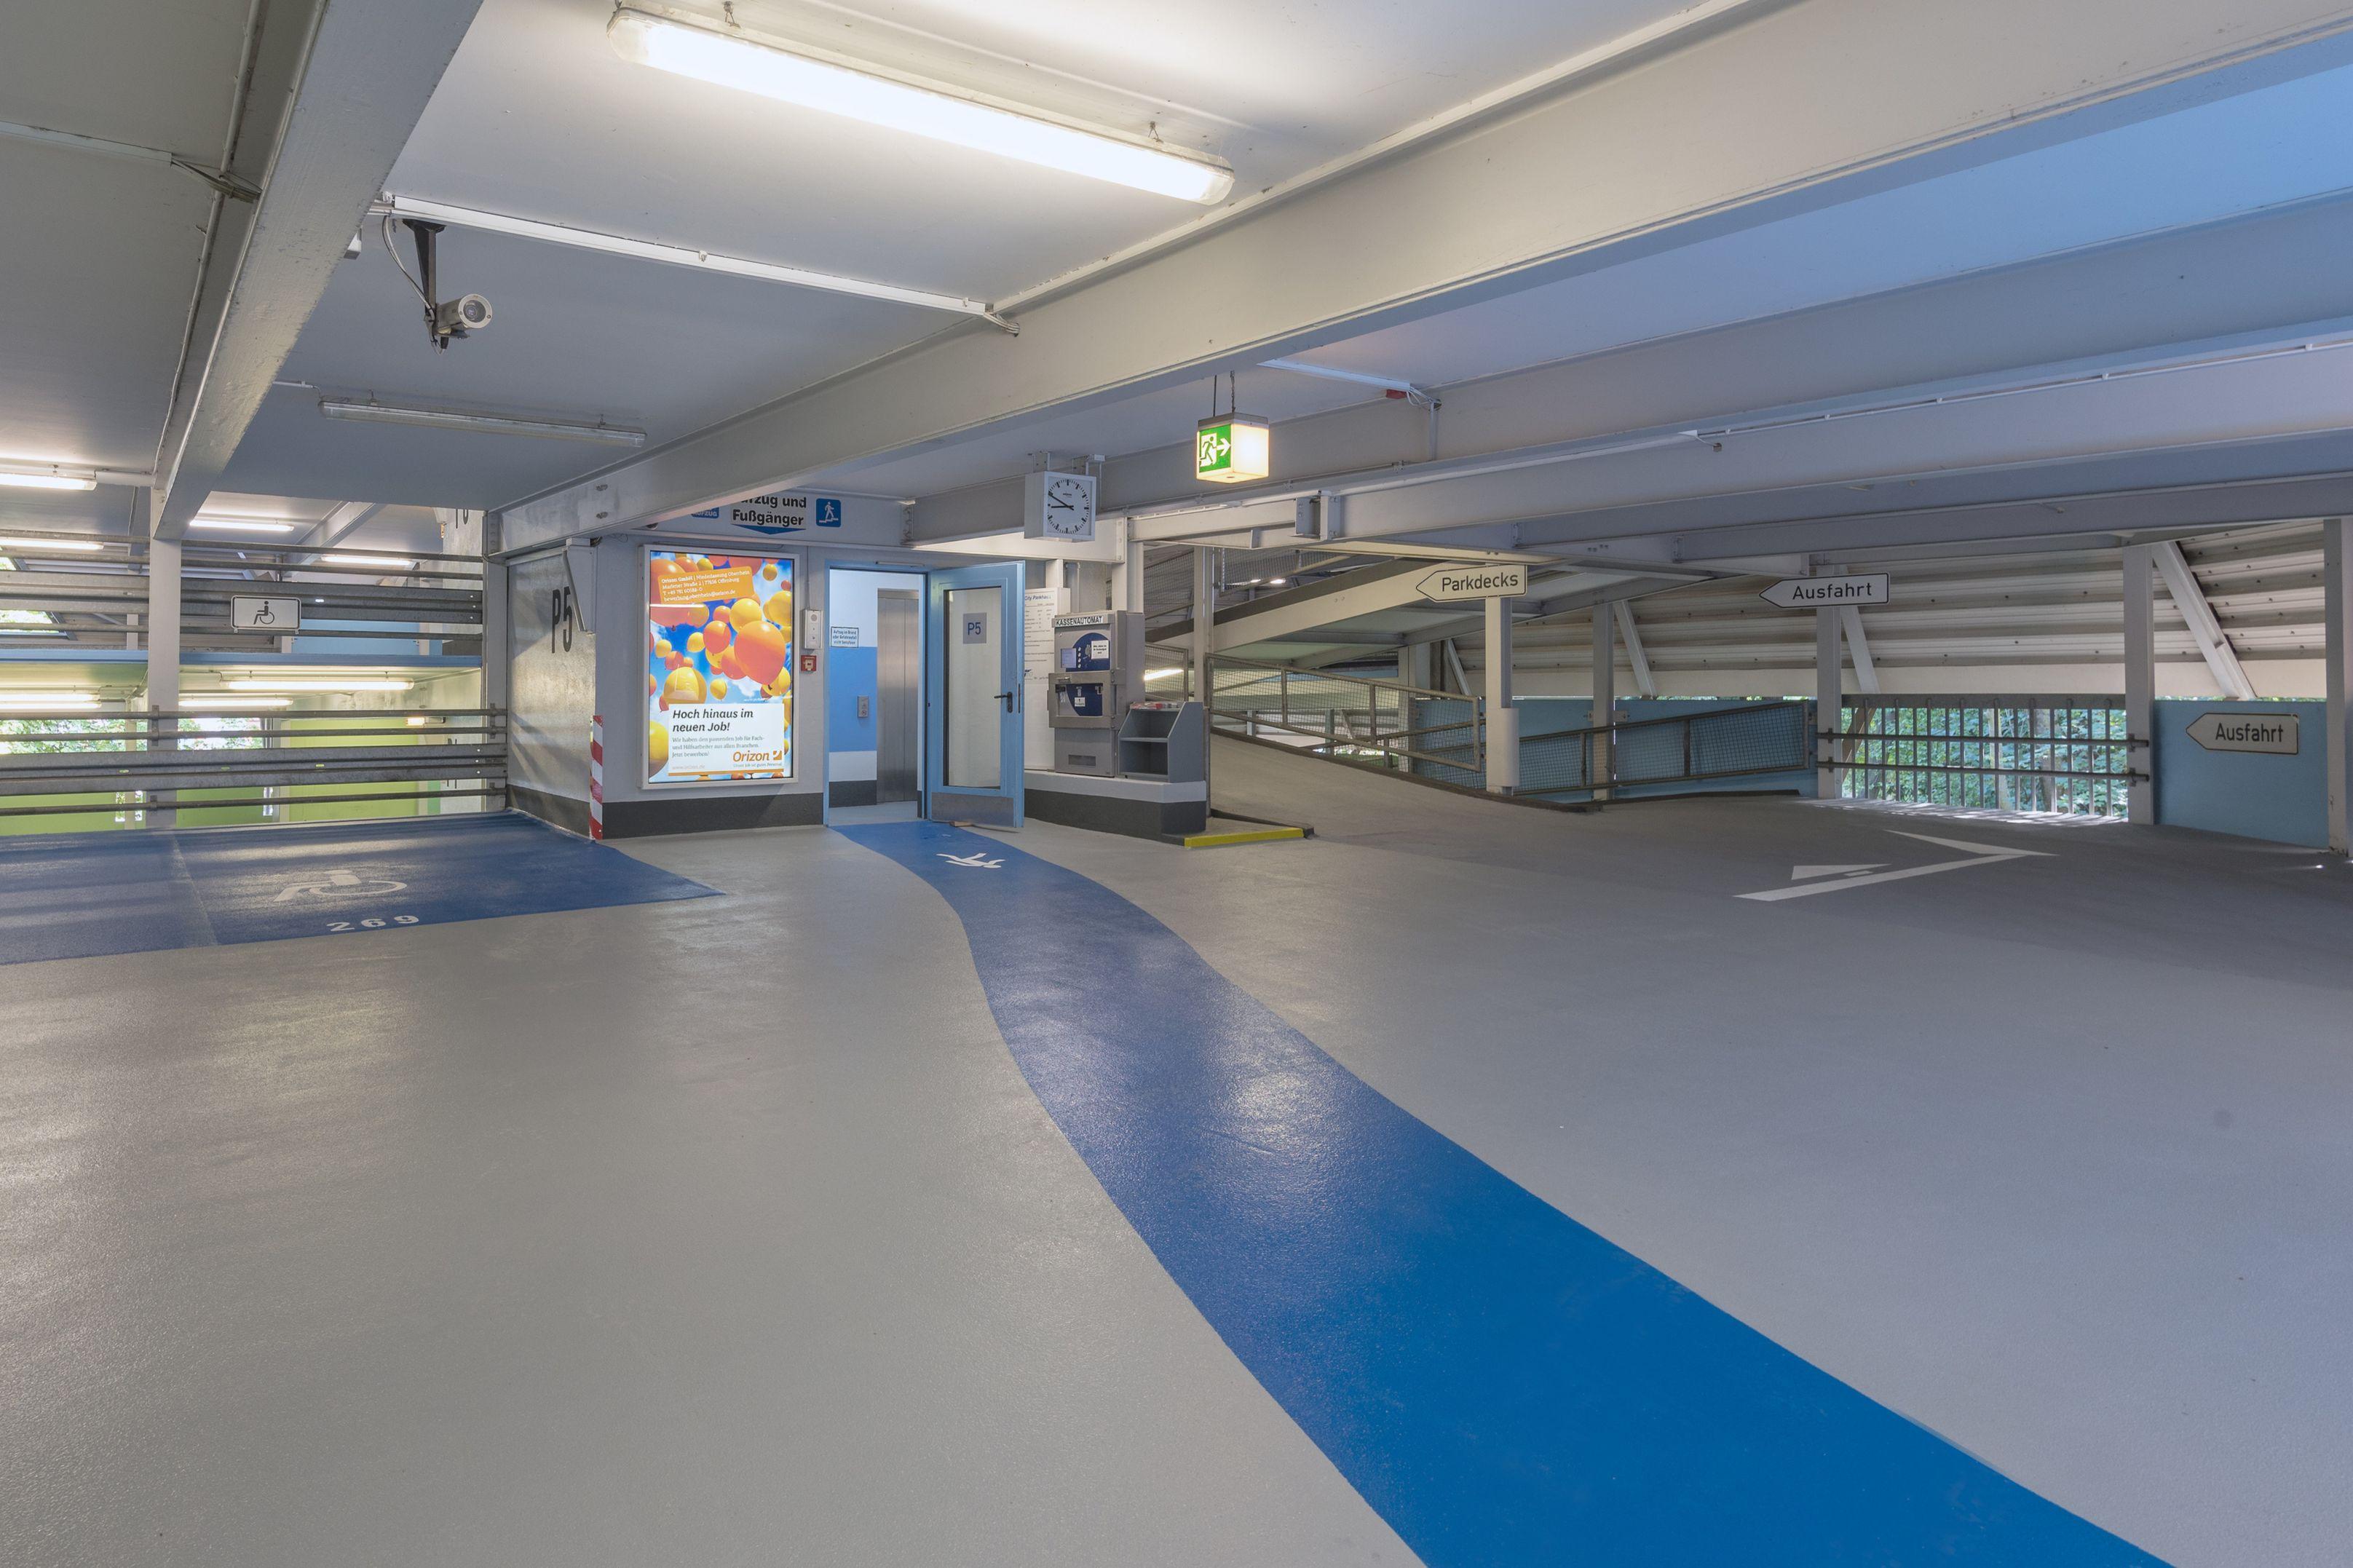 Flooring: Parkhaus Offenburg